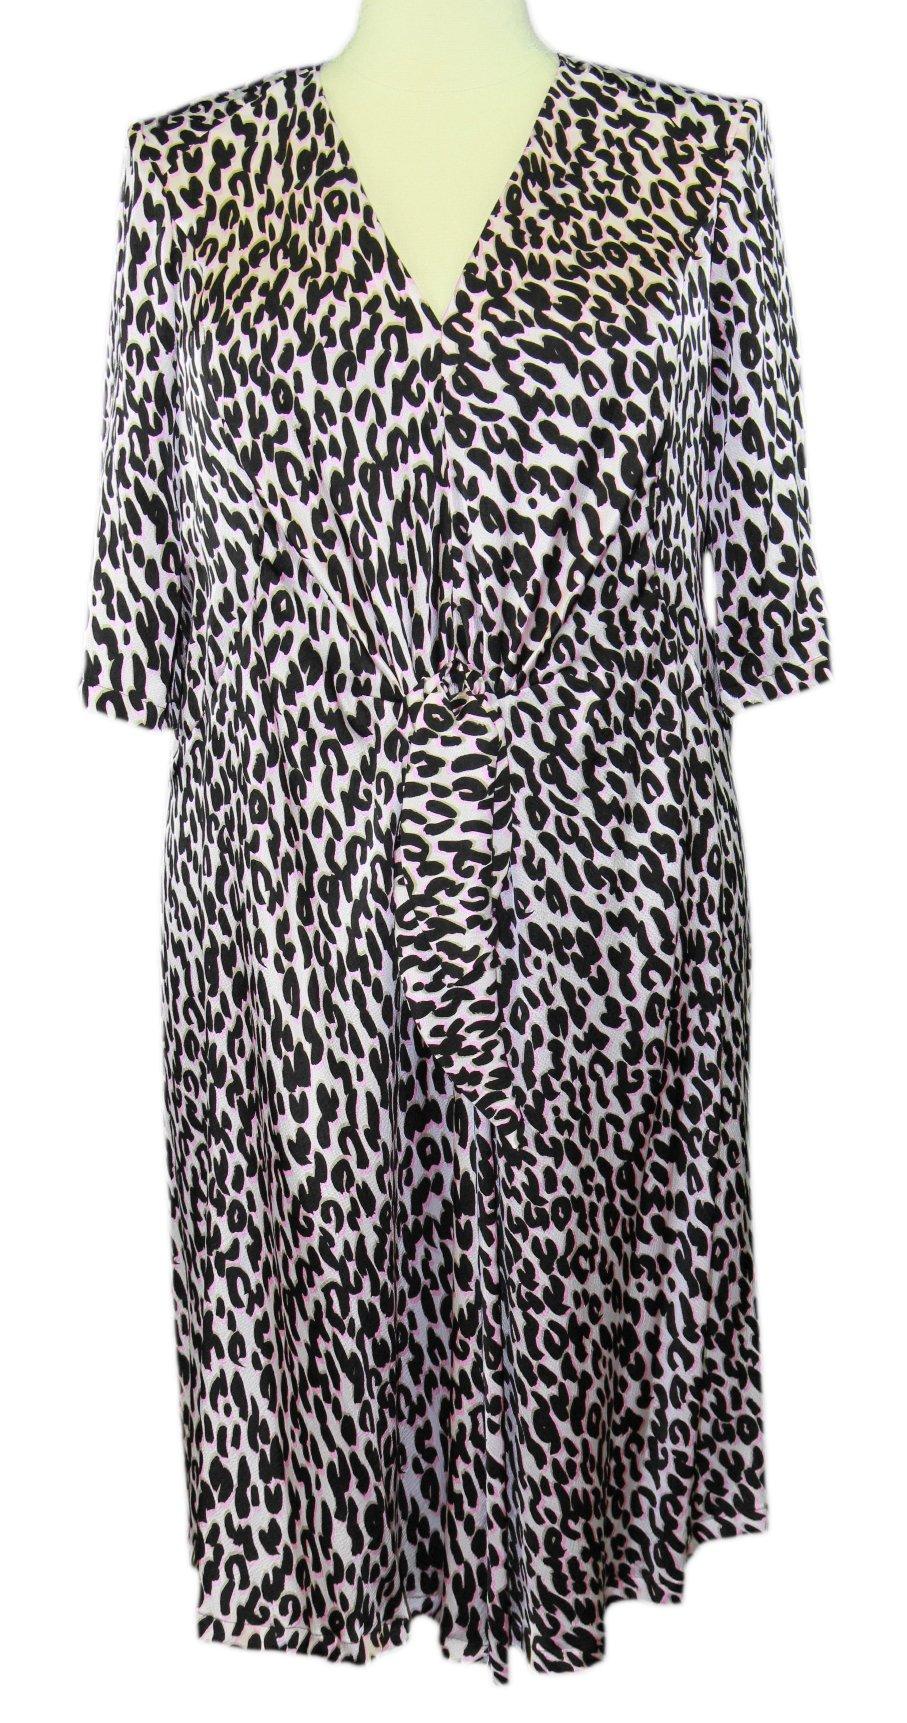 MARINA RINALDI by MaxMara Nixon Pink Animal Print V-Neck Dress 20W / 29